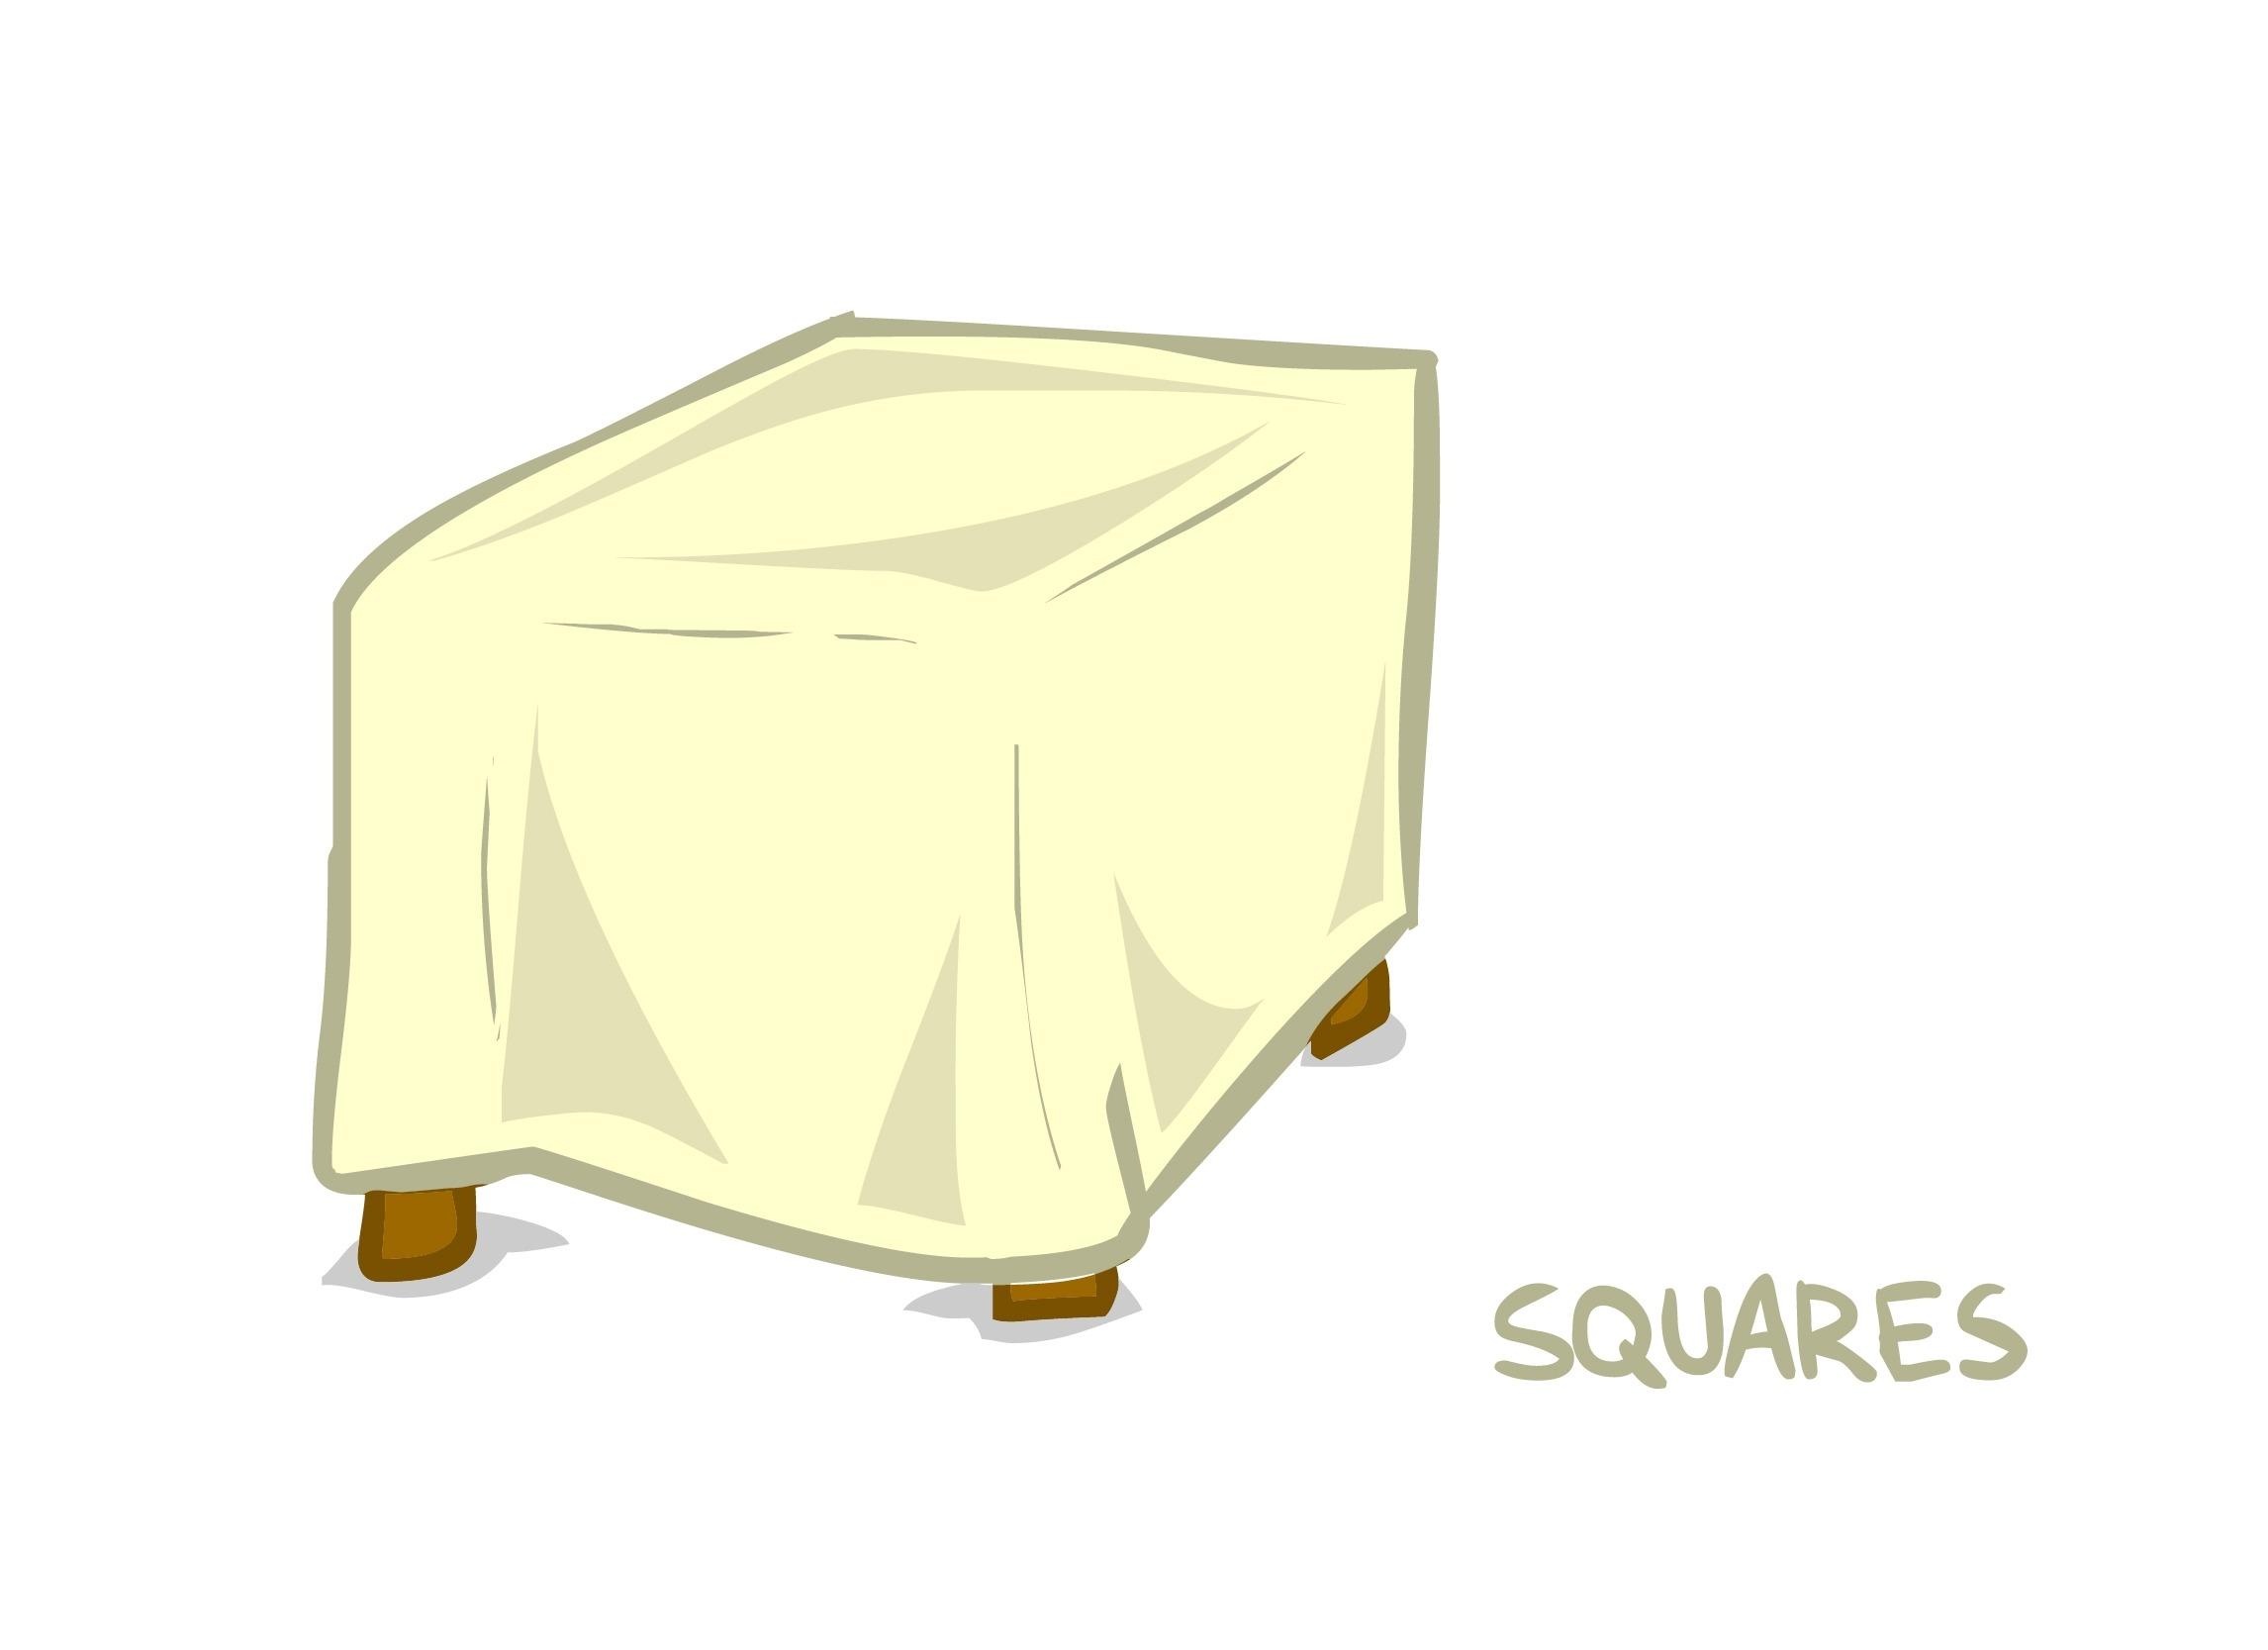 9802 Vinyl Square Tablecloths 01403